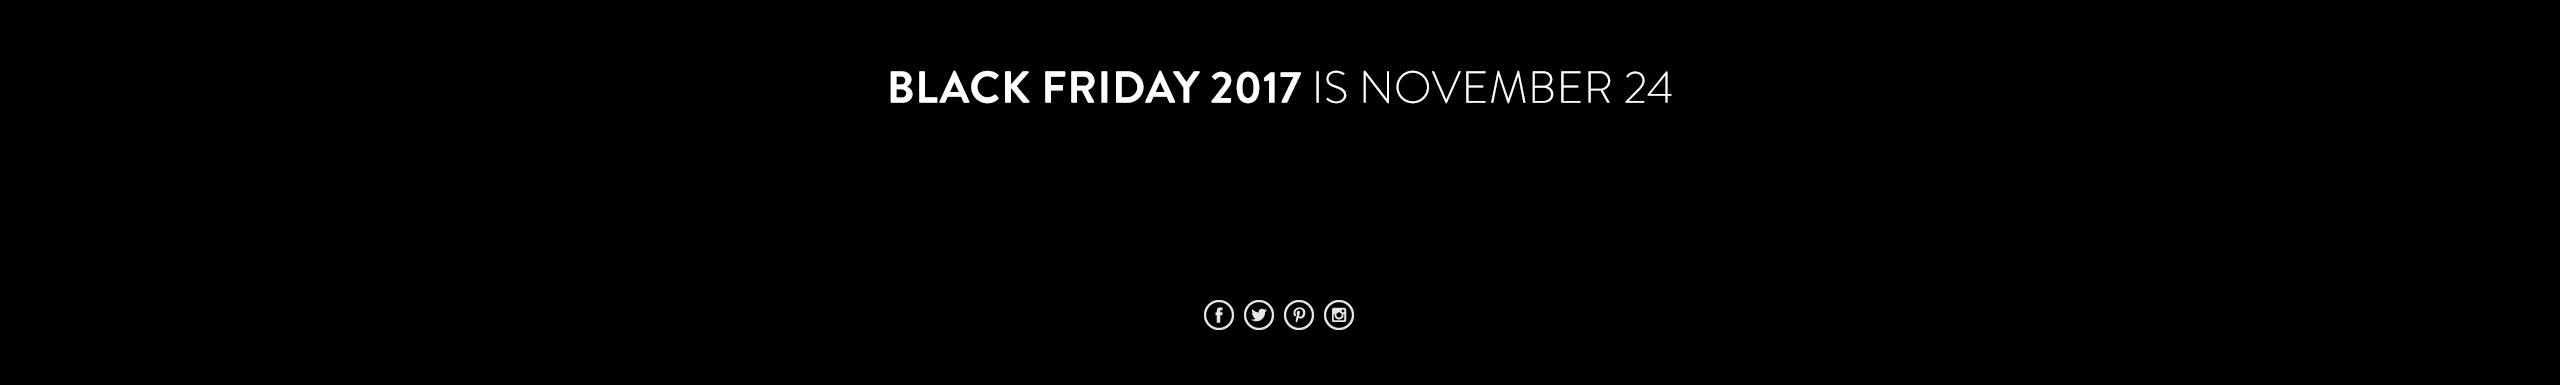 Black Friday 2017 is November 24.